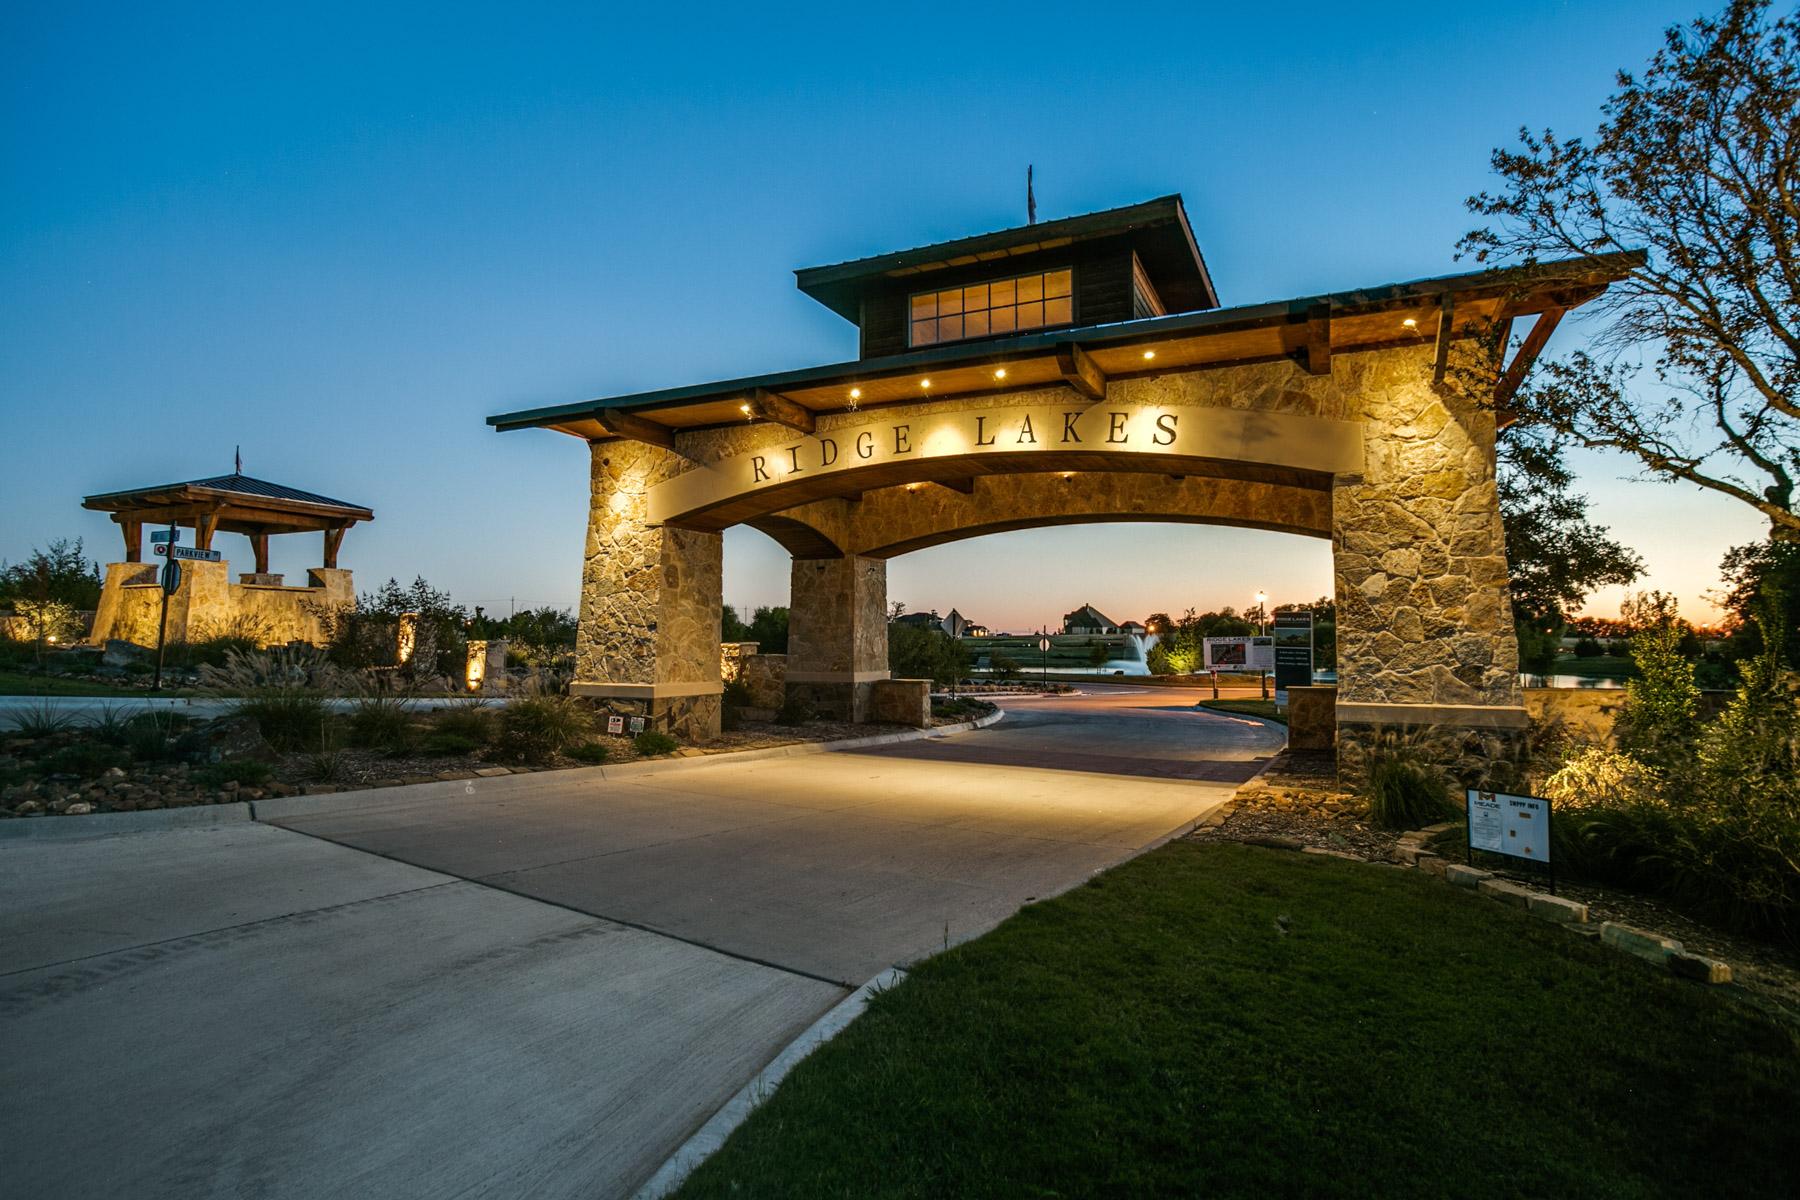 Земля для того Продажа на .58 Acres in Ridge Lakes of Heath 527 Lodge Hill Drive, Heath, Техас, 75032 Соединенные Штаты